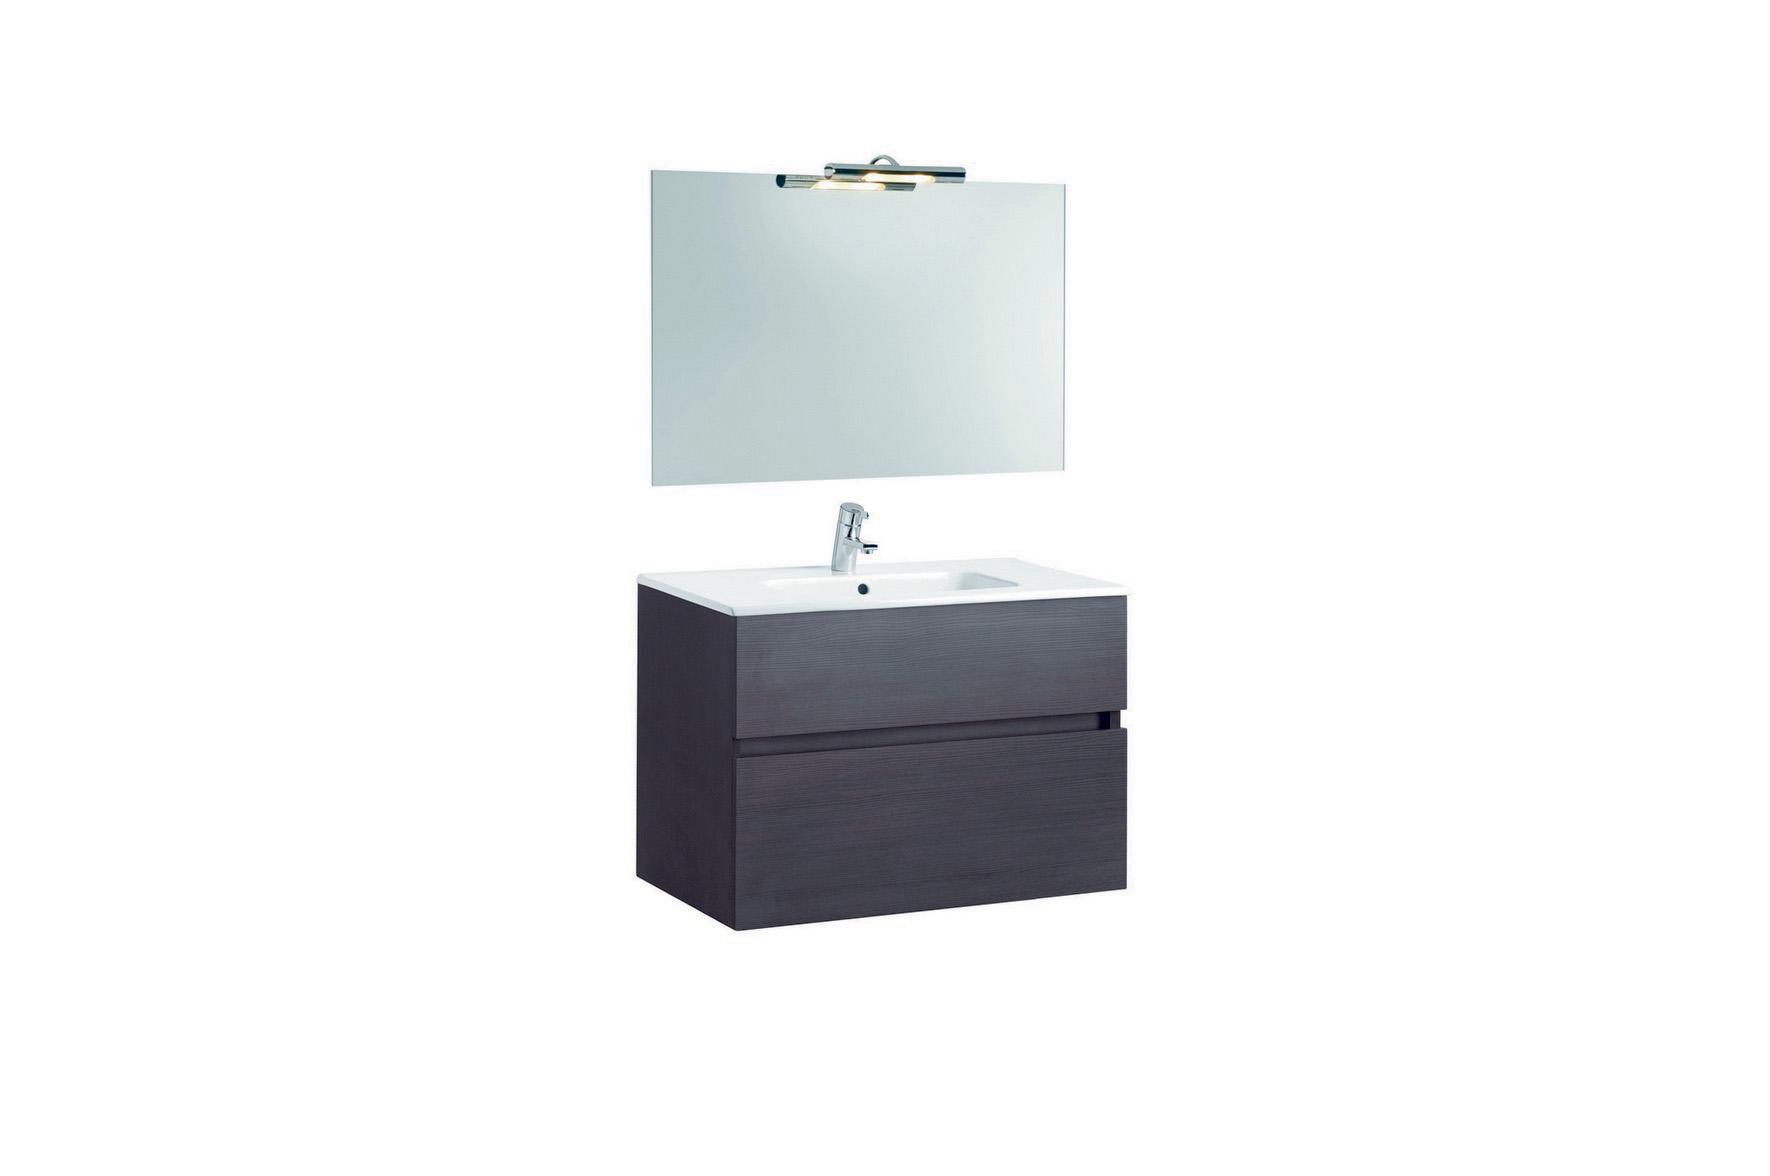 Mobilier Jade 80 cm negru cu lavoar Smile si oglinda cu spot GALA - Poza 10